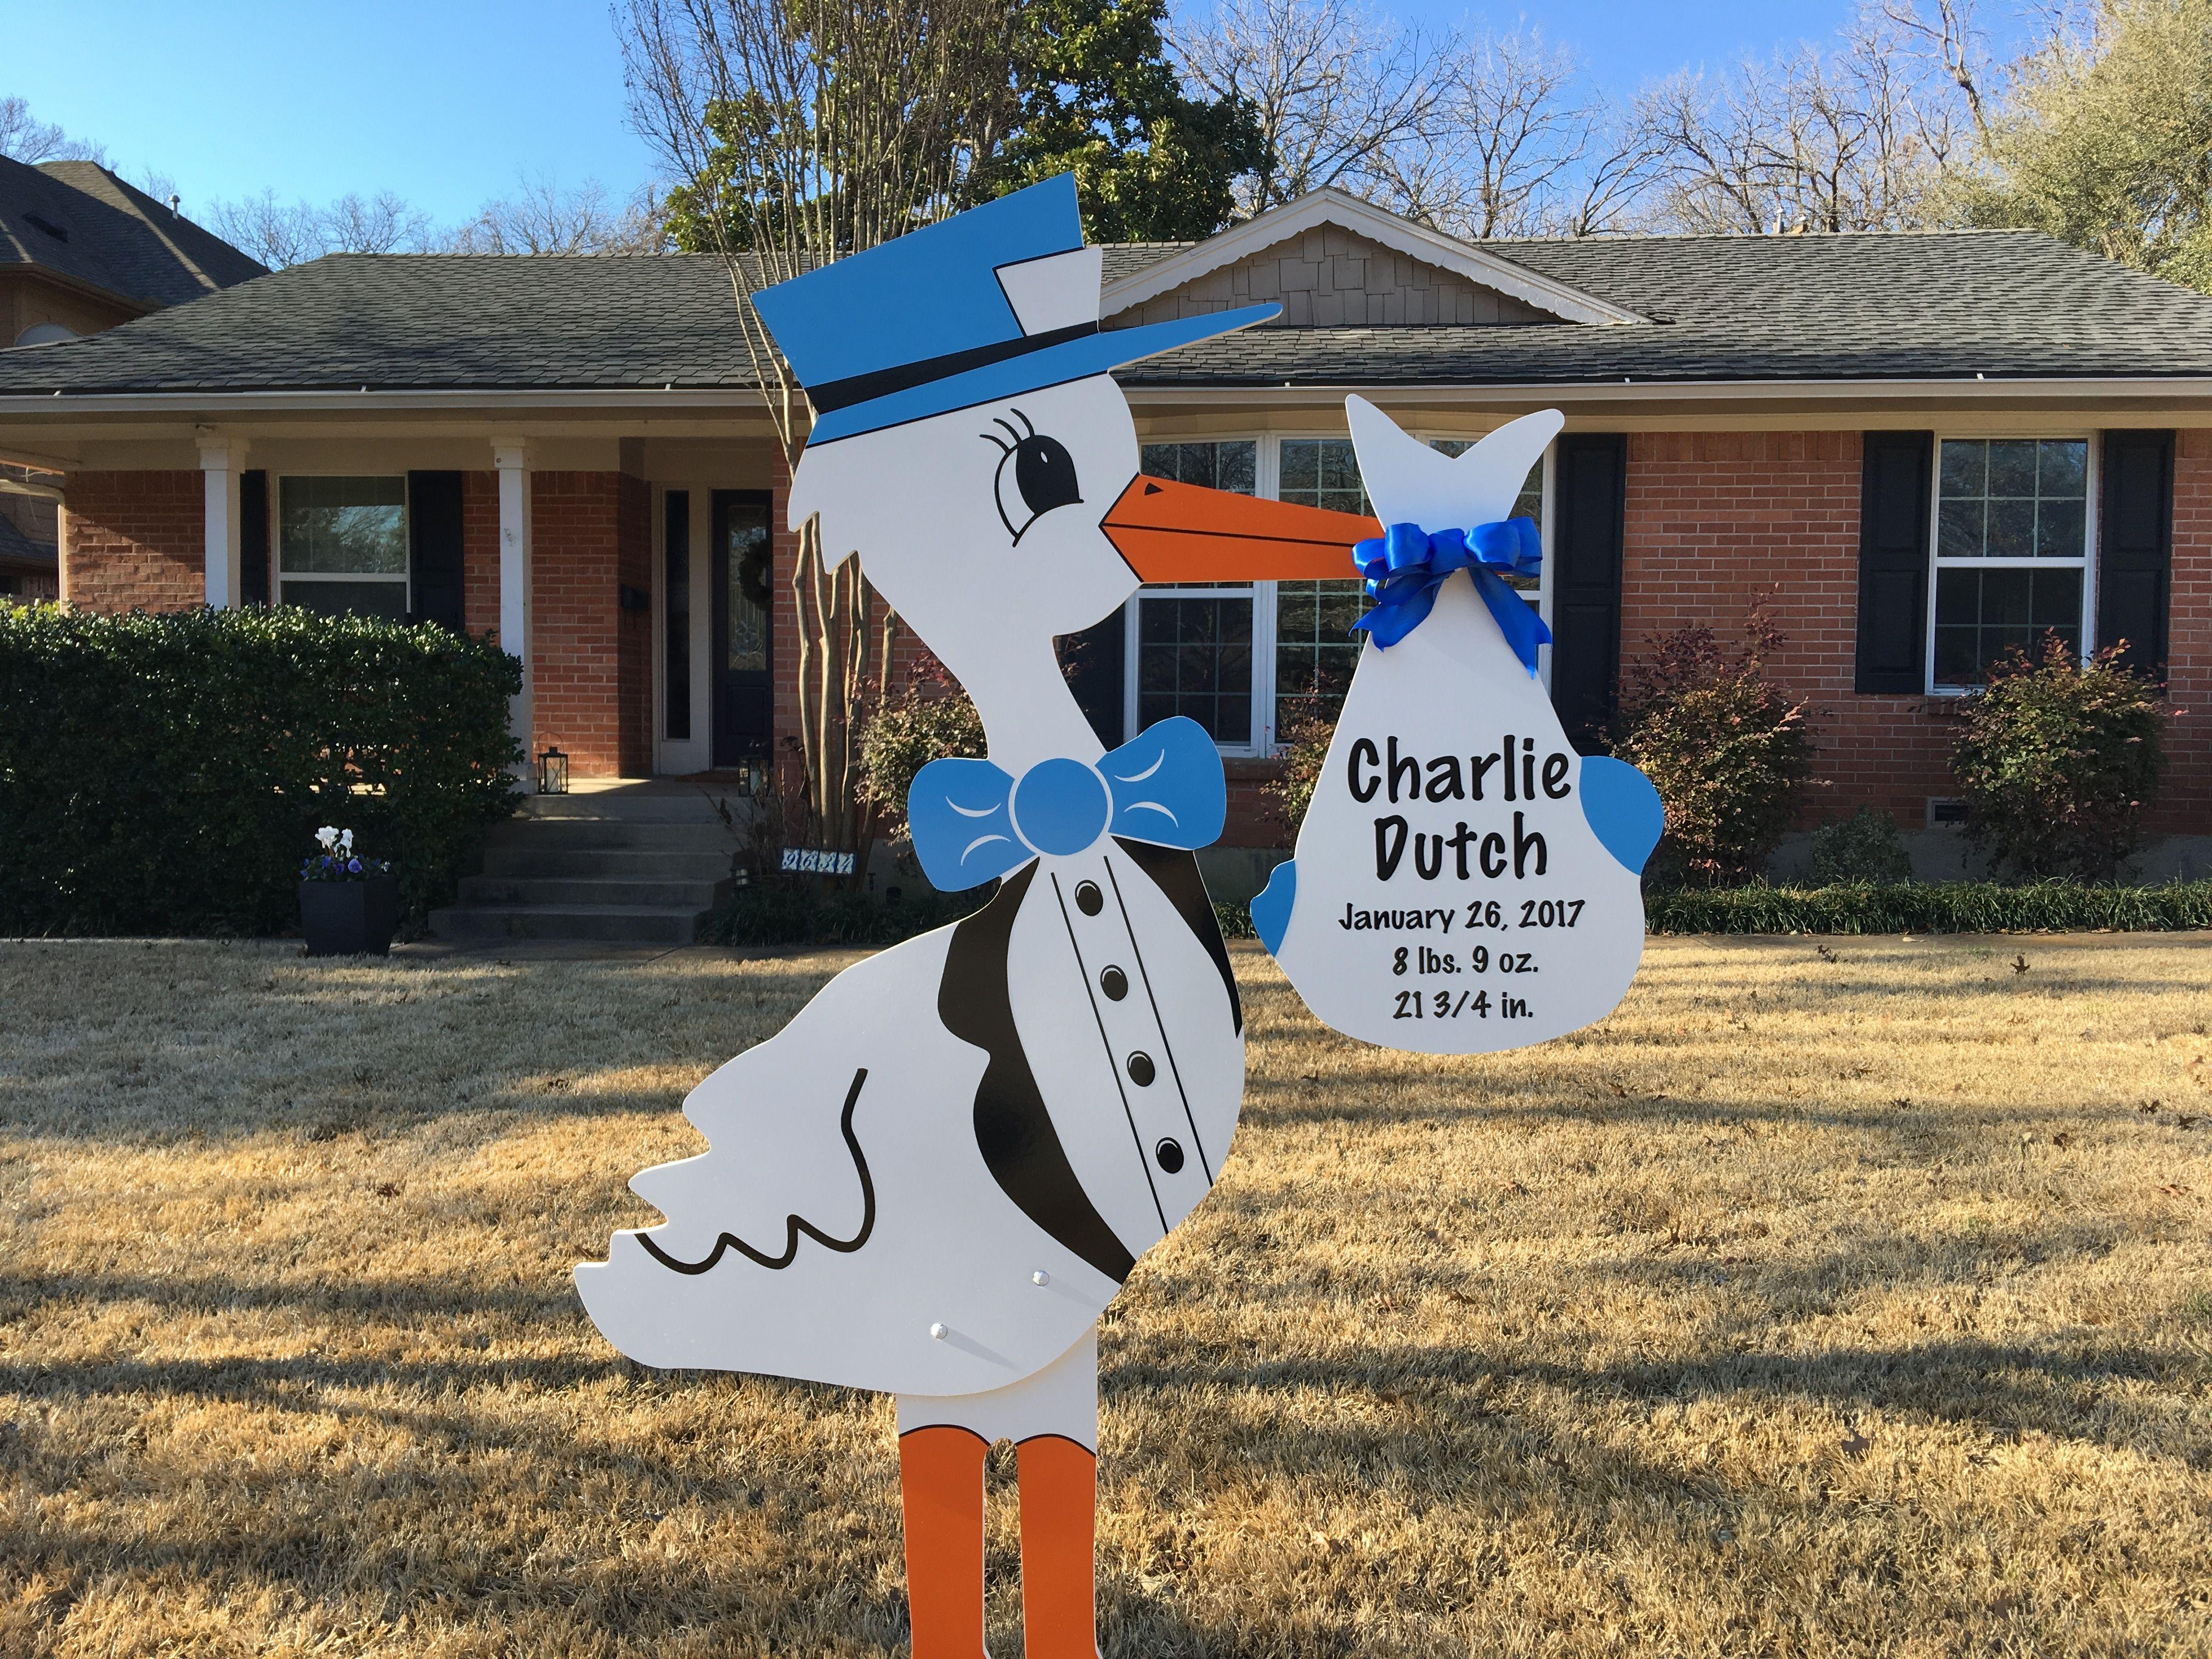 Lake Highlands Dallas Stork Yard Sign Storks More Of Dallas And Abilene Dallas 214 923 1569 Abilene 325 733 Stork Yard Sign Birthday Lawn Signs Abilene